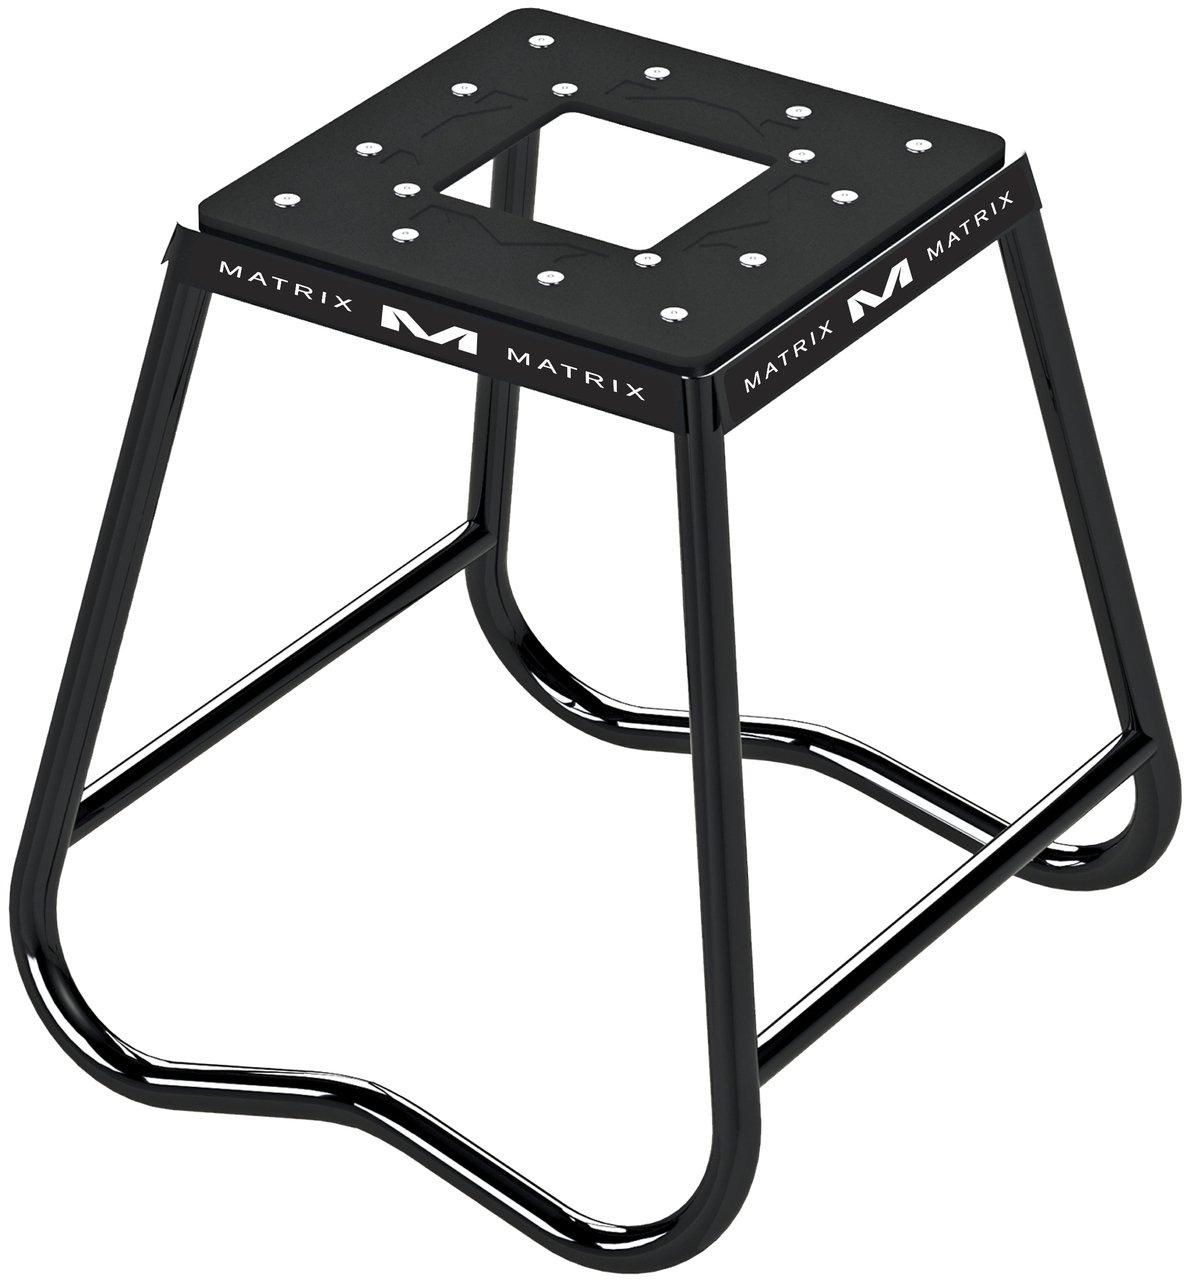 Matrix Concepts C1 Carbon Steel Stand, Black